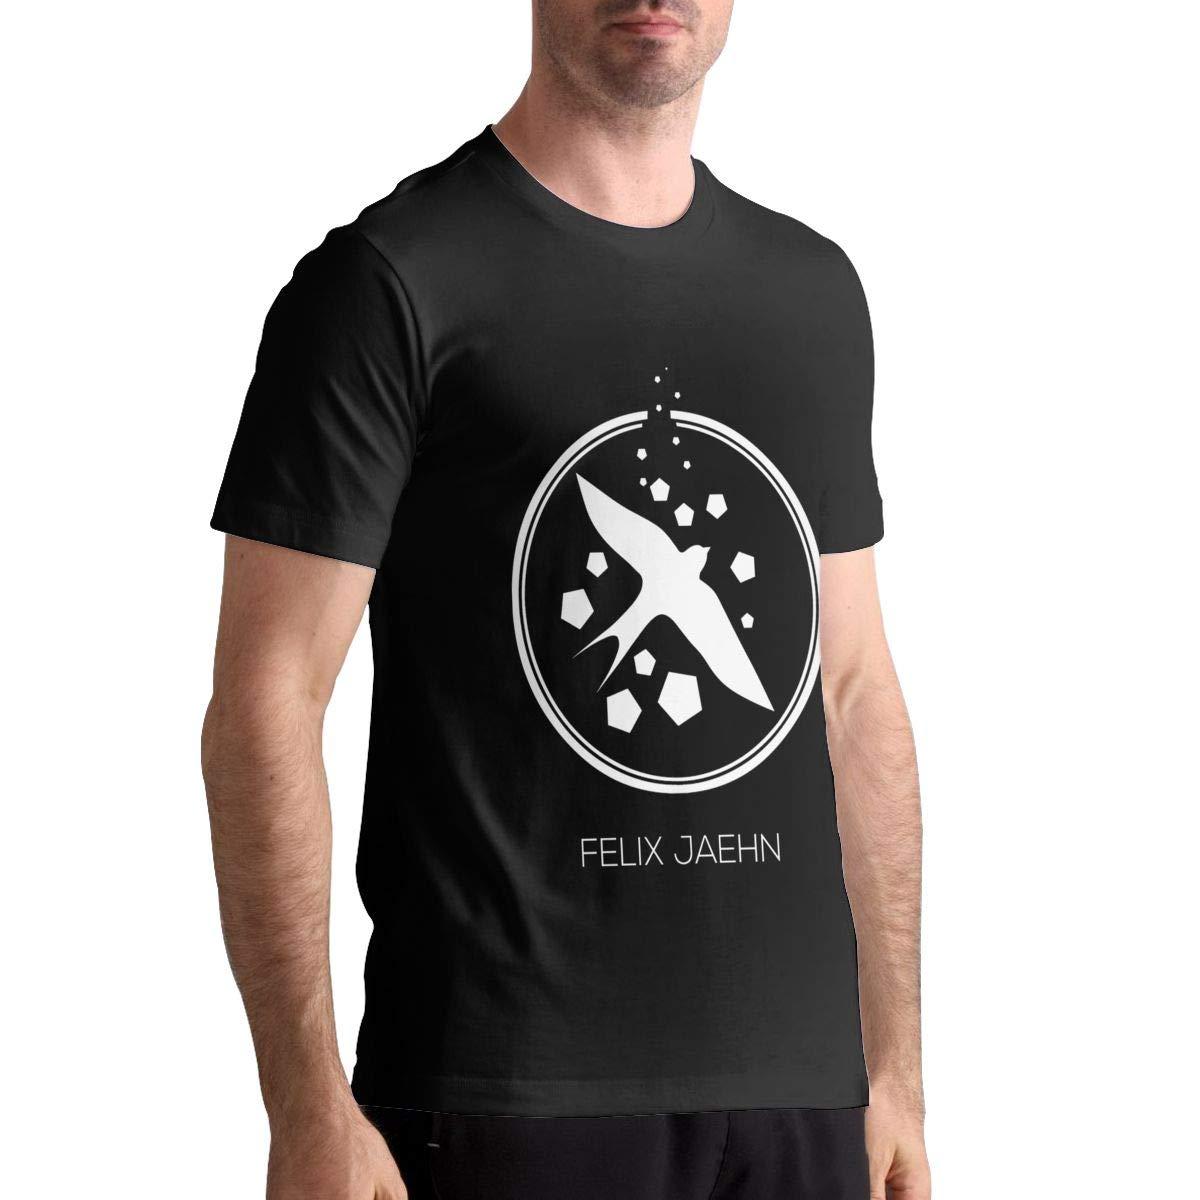 EVE KENNEDY Causal Felix Jaehn Man T-Shirts Top Tees Short Sleeve Black Shirts